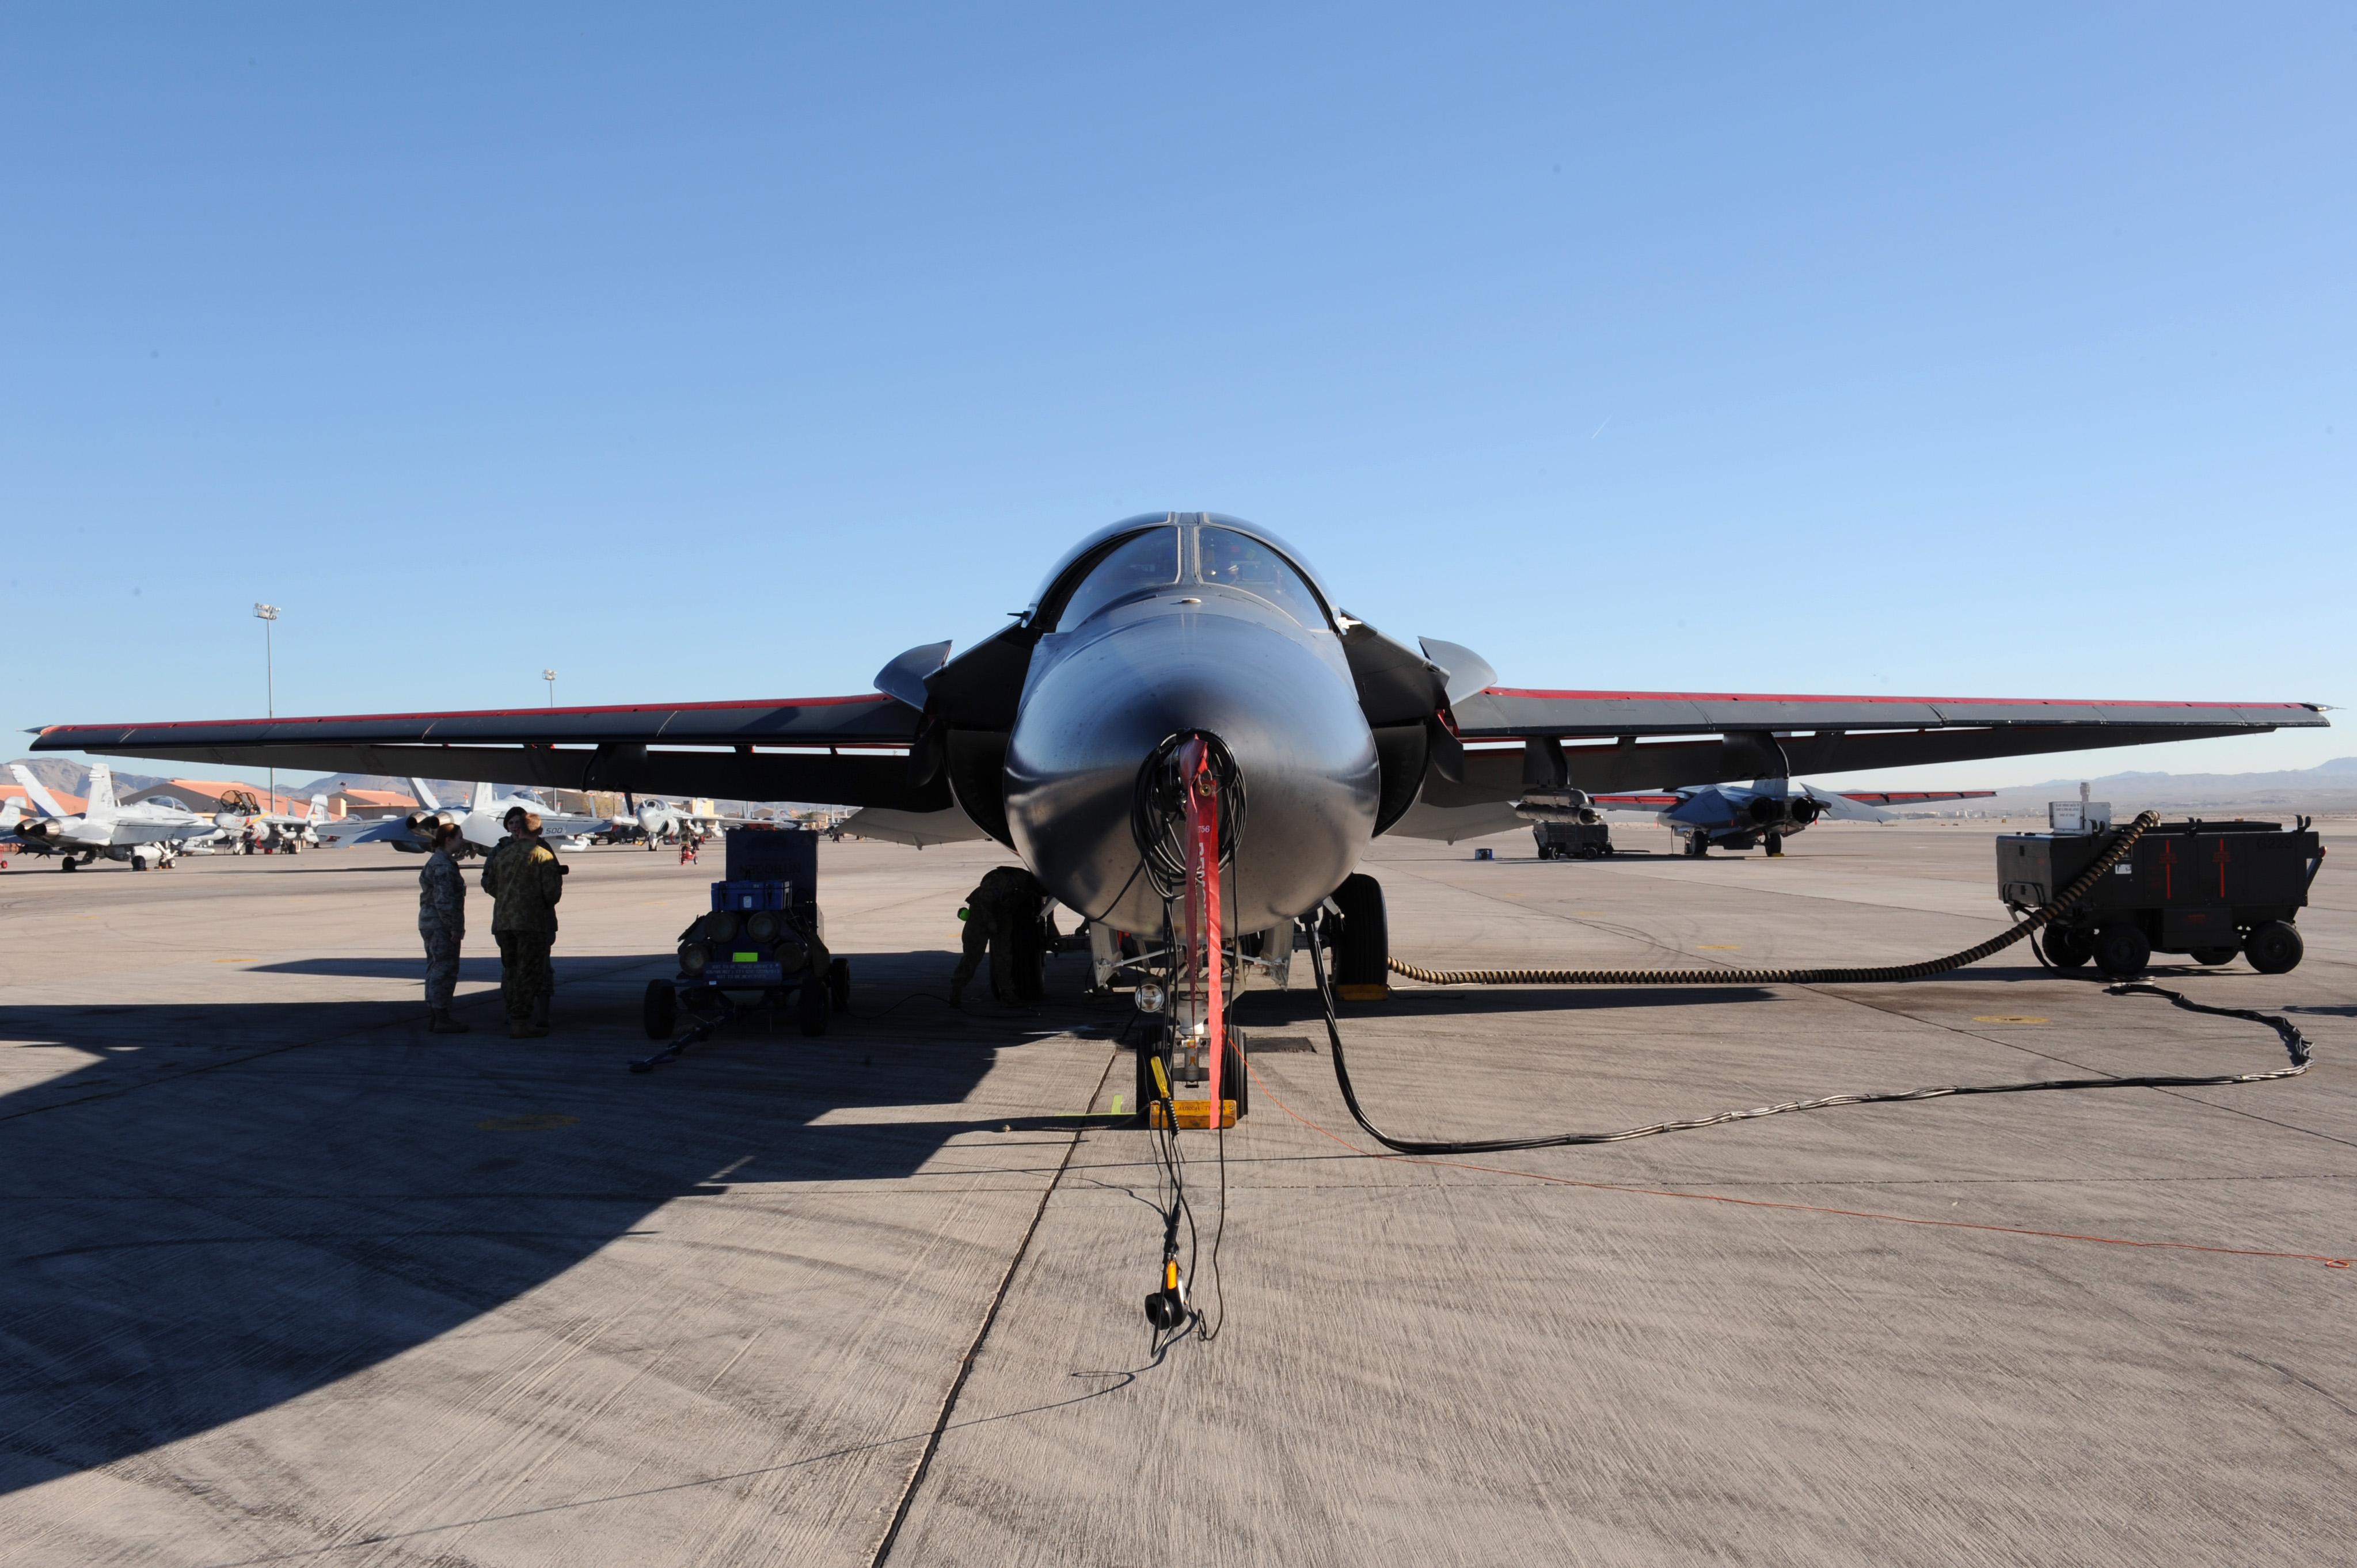 File:F-111C forward view 2009.jpg - Wikimedia Commons